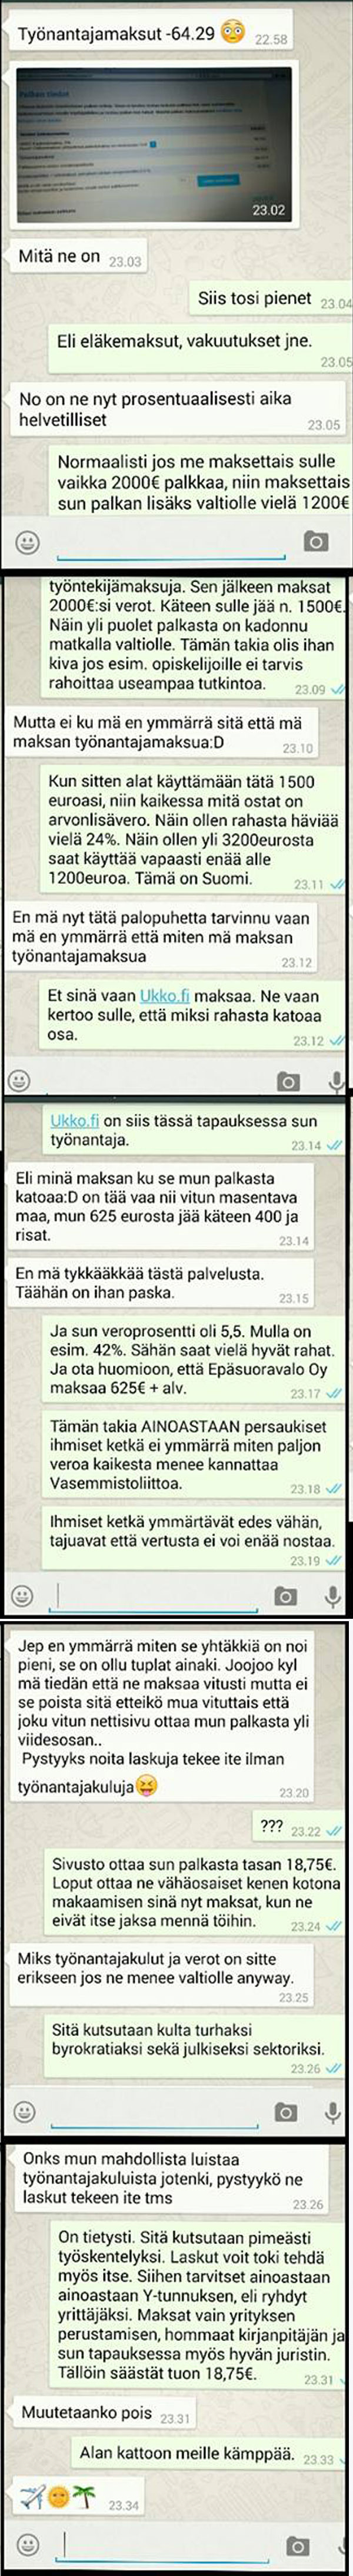 Facebook, Panu Rekilä